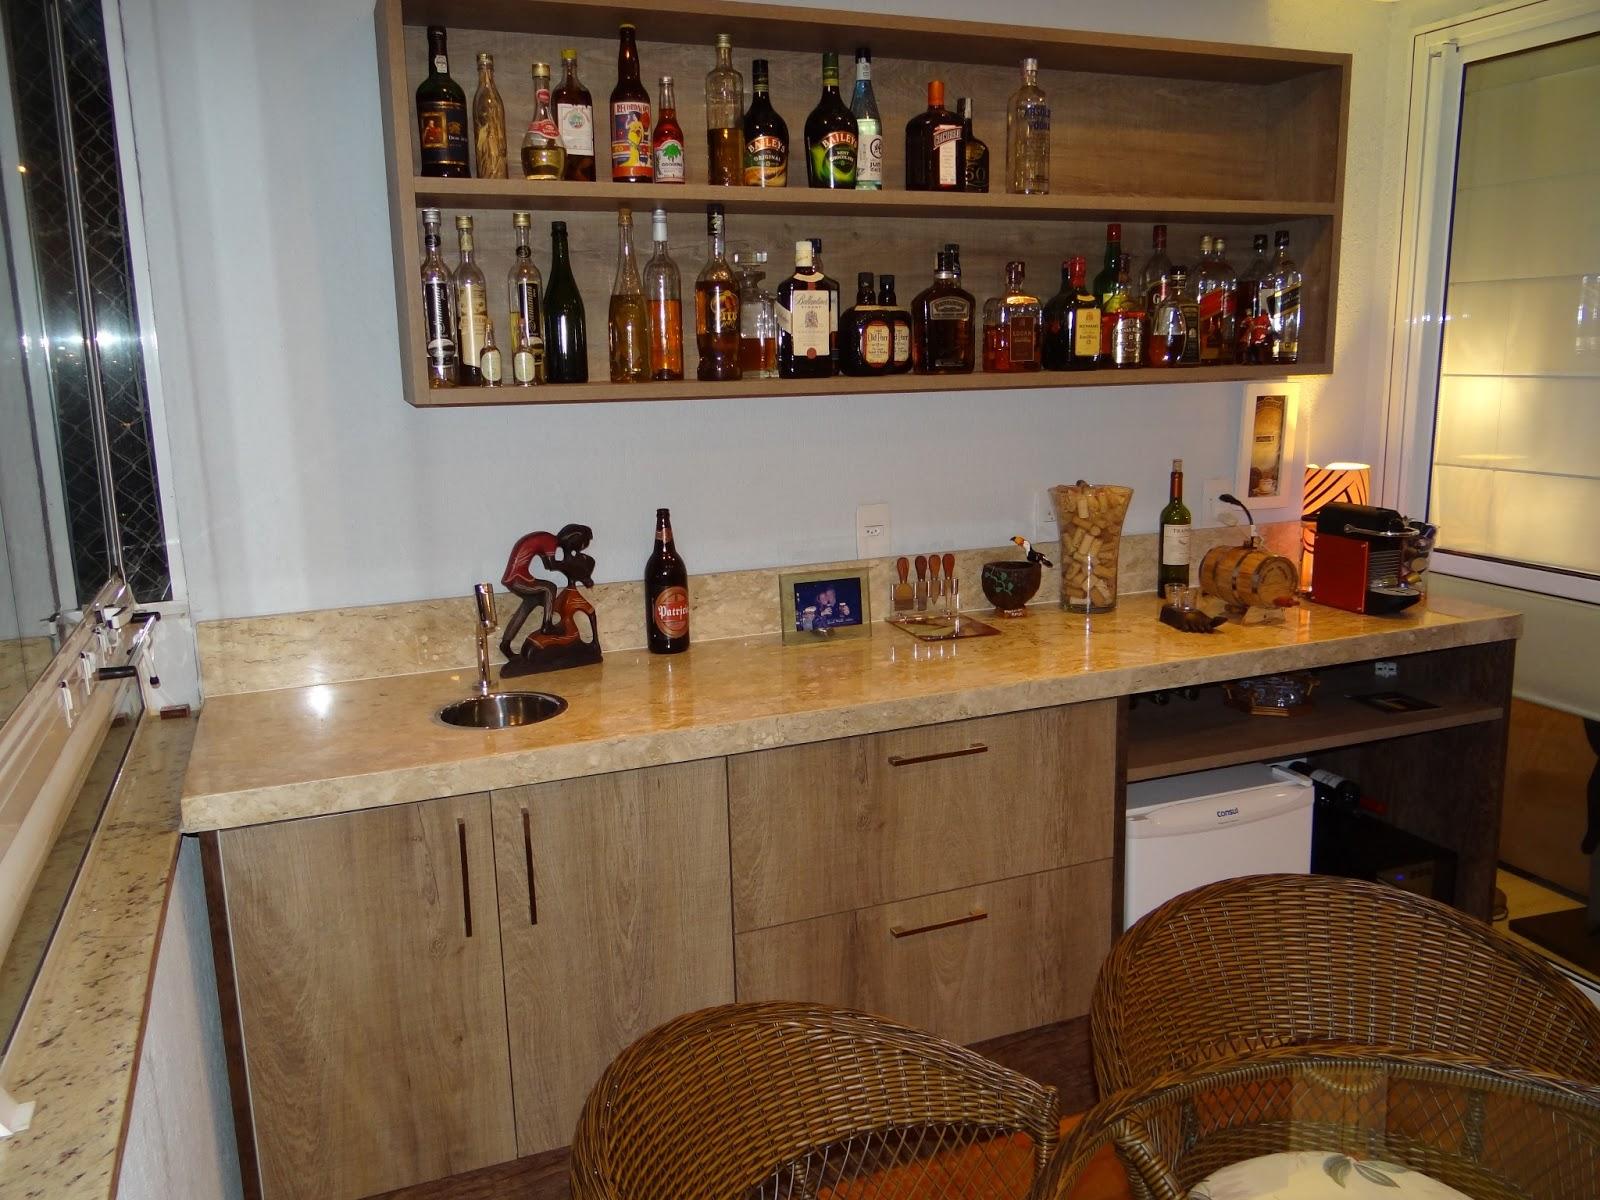 instalada na bancada para auxiliar na limpeza e preparo dos drinks #9B6830 1600x1200